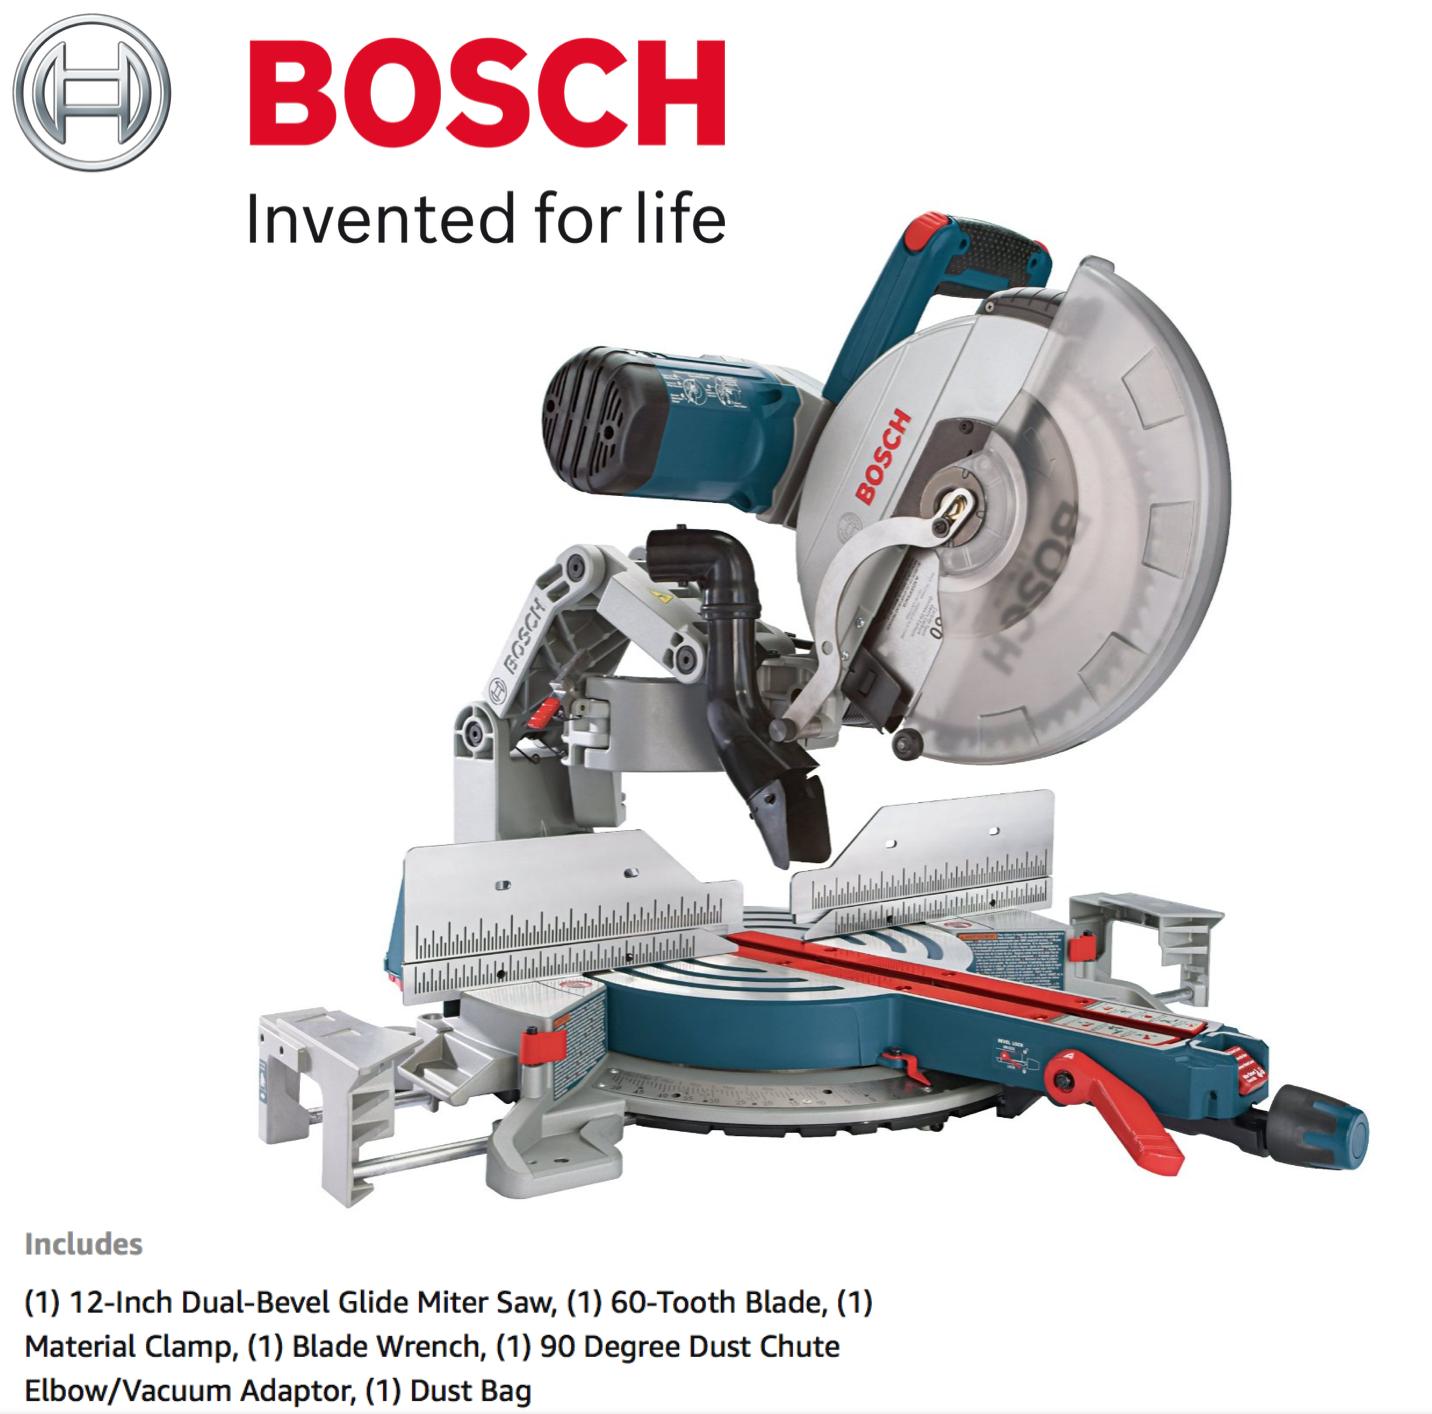 Bosch Compound Miter Saw GCM12SD - 120-Volt, 12-Inch Dual Be